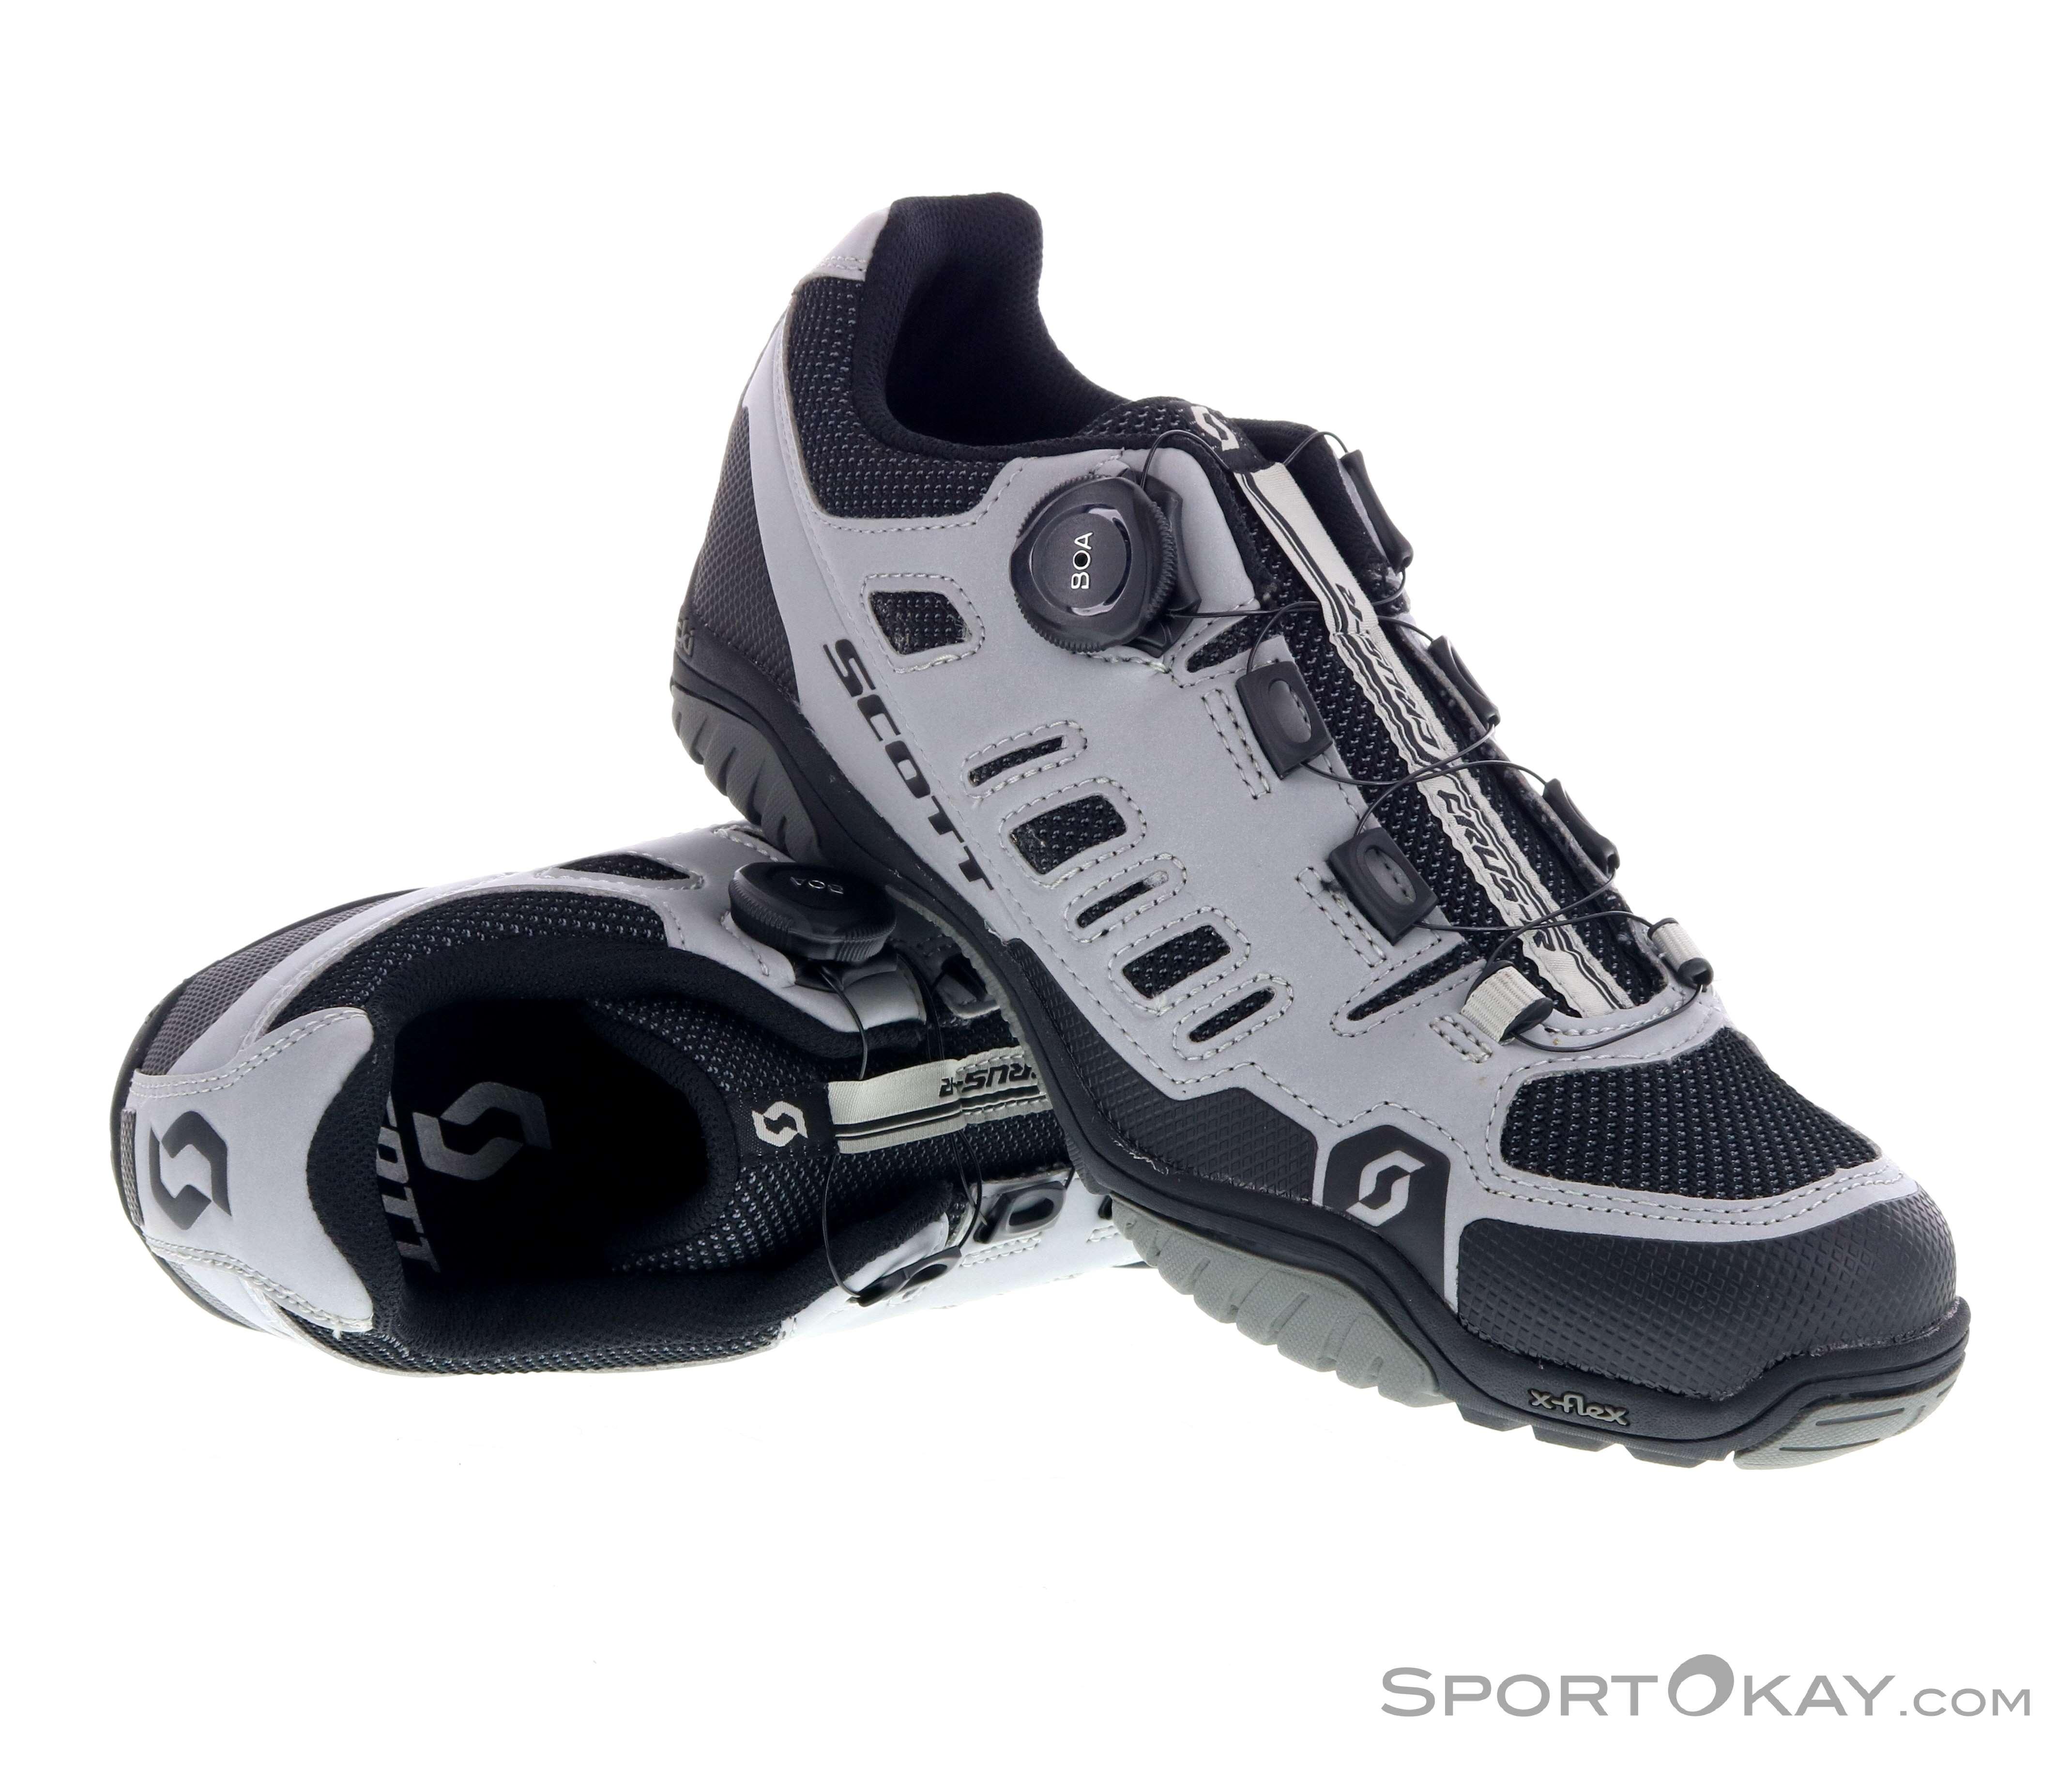 cbab20b1314ecf Scott Sport Crus-R Boa Reflective Mens Biking Shoes - Mountain Bike ...